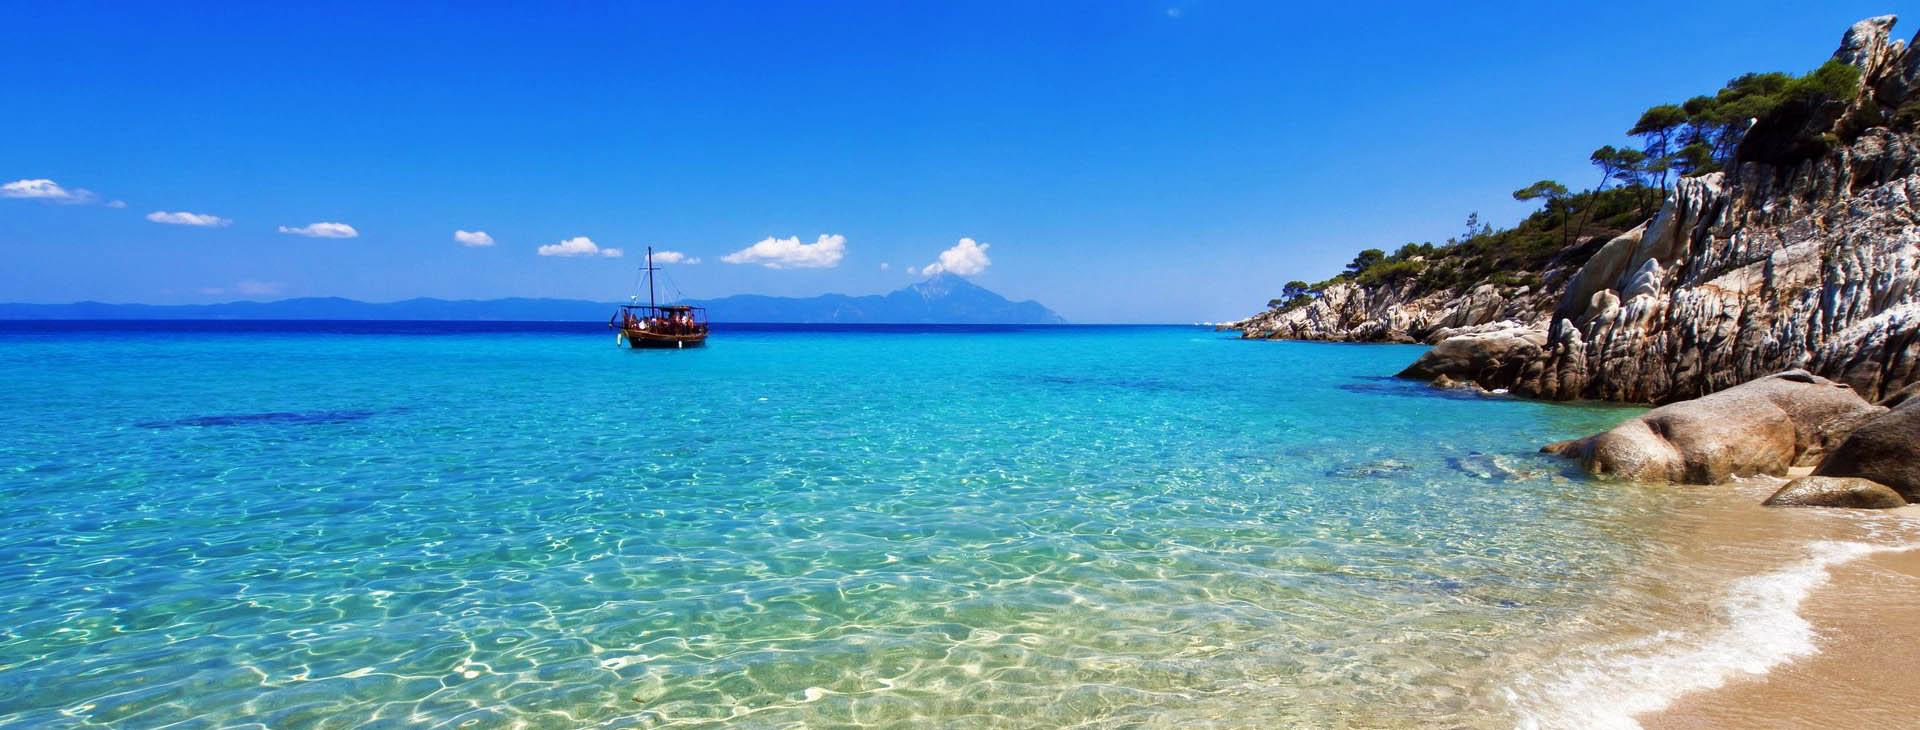 Paradise bay beach at Halkidiki (Chalkidiki)